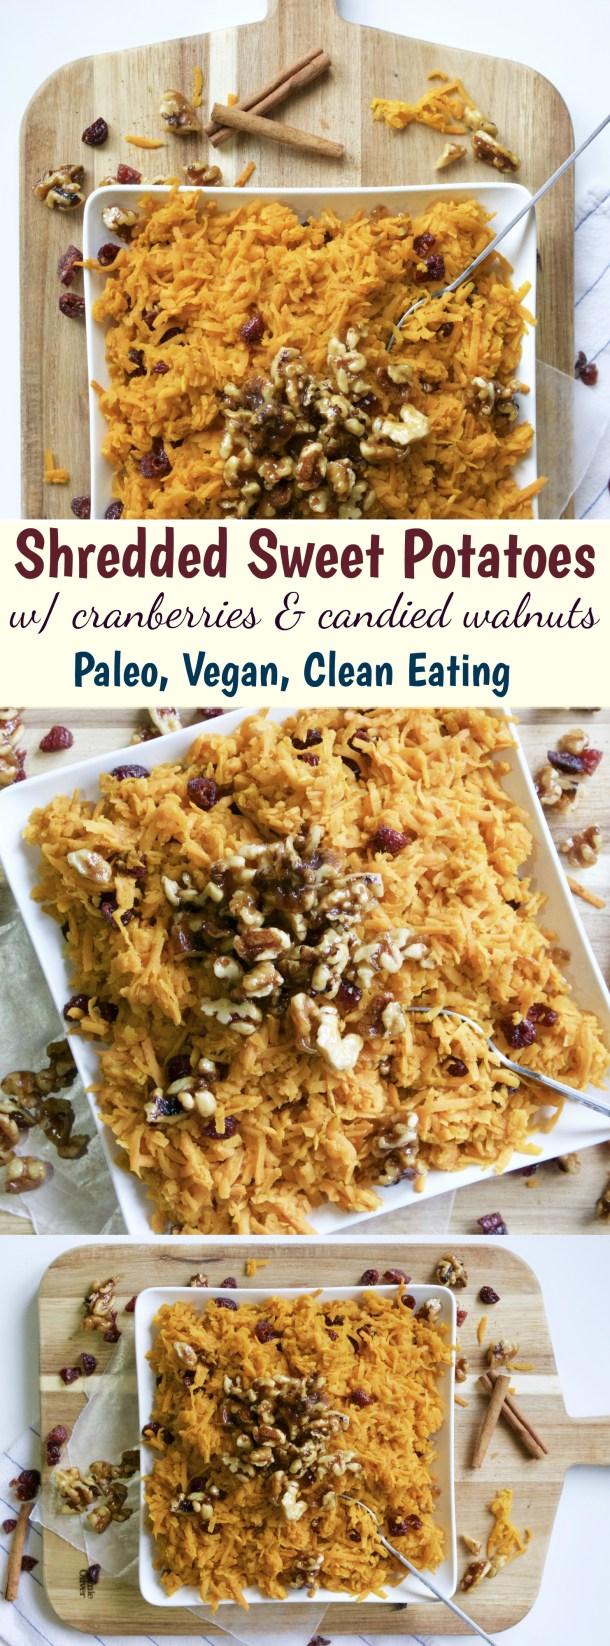 How To Shred Sweet Potatoes Food Processor